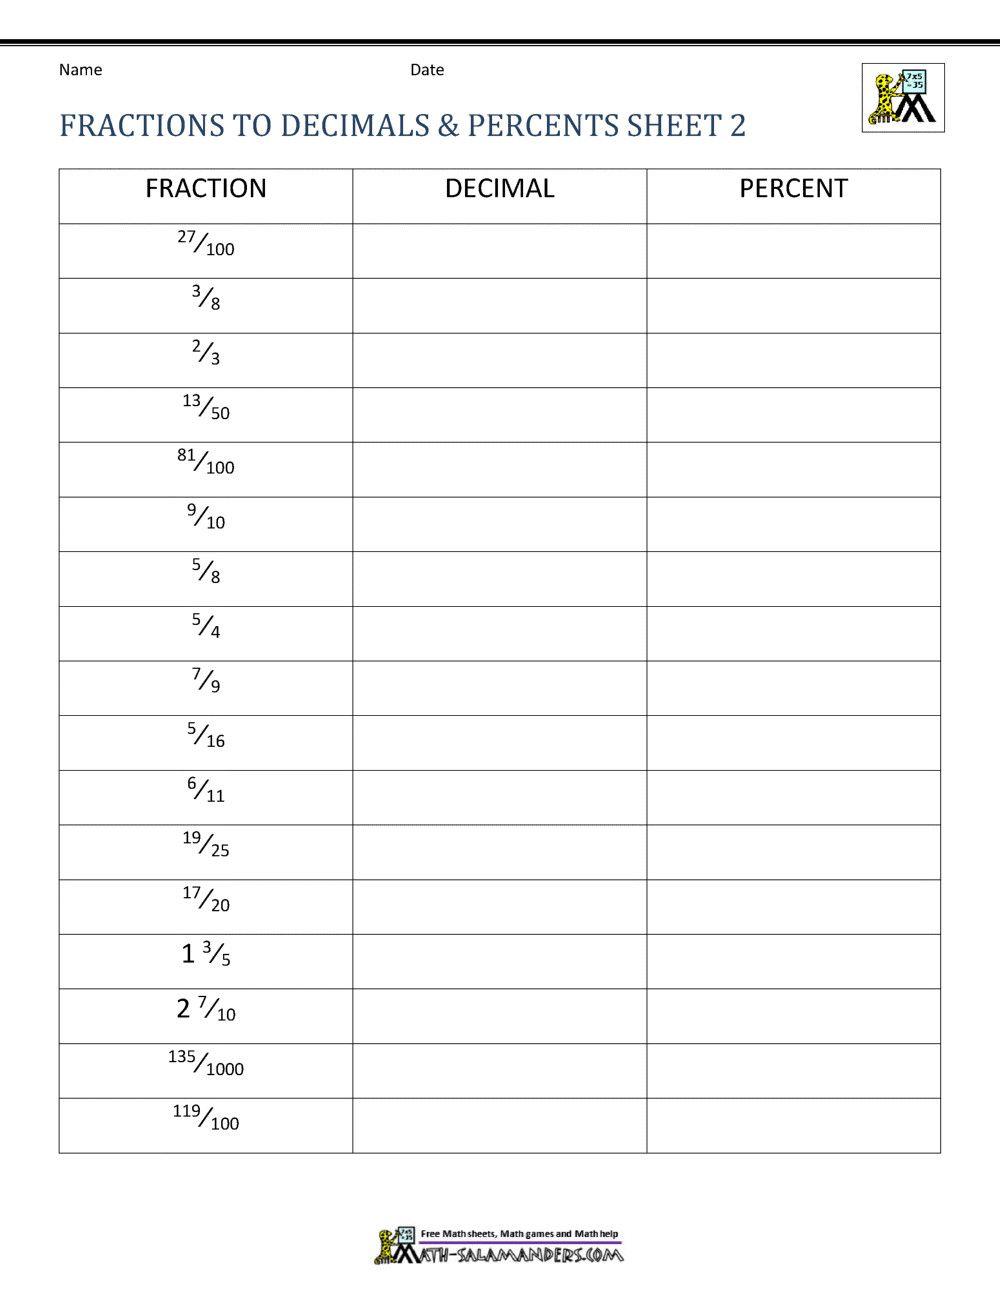 Wonderful Fraction Decimal Percent Chart In 2020 Free Math Worksheets Decimals Worksheets Math Worksheets